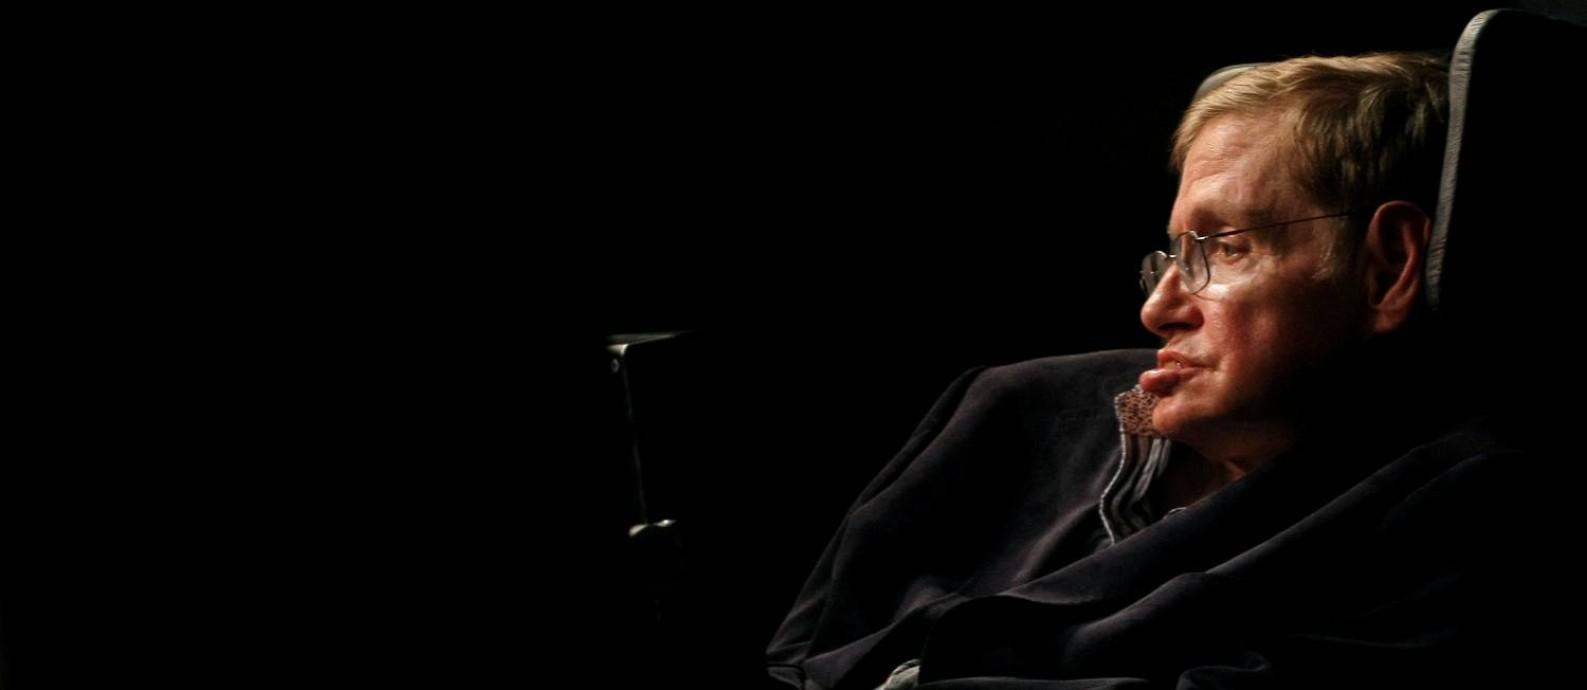 O físico teórico Stephen Hawking morreu em março deste ano Foto: Mike Hutchings / Reuters/11-05-2008